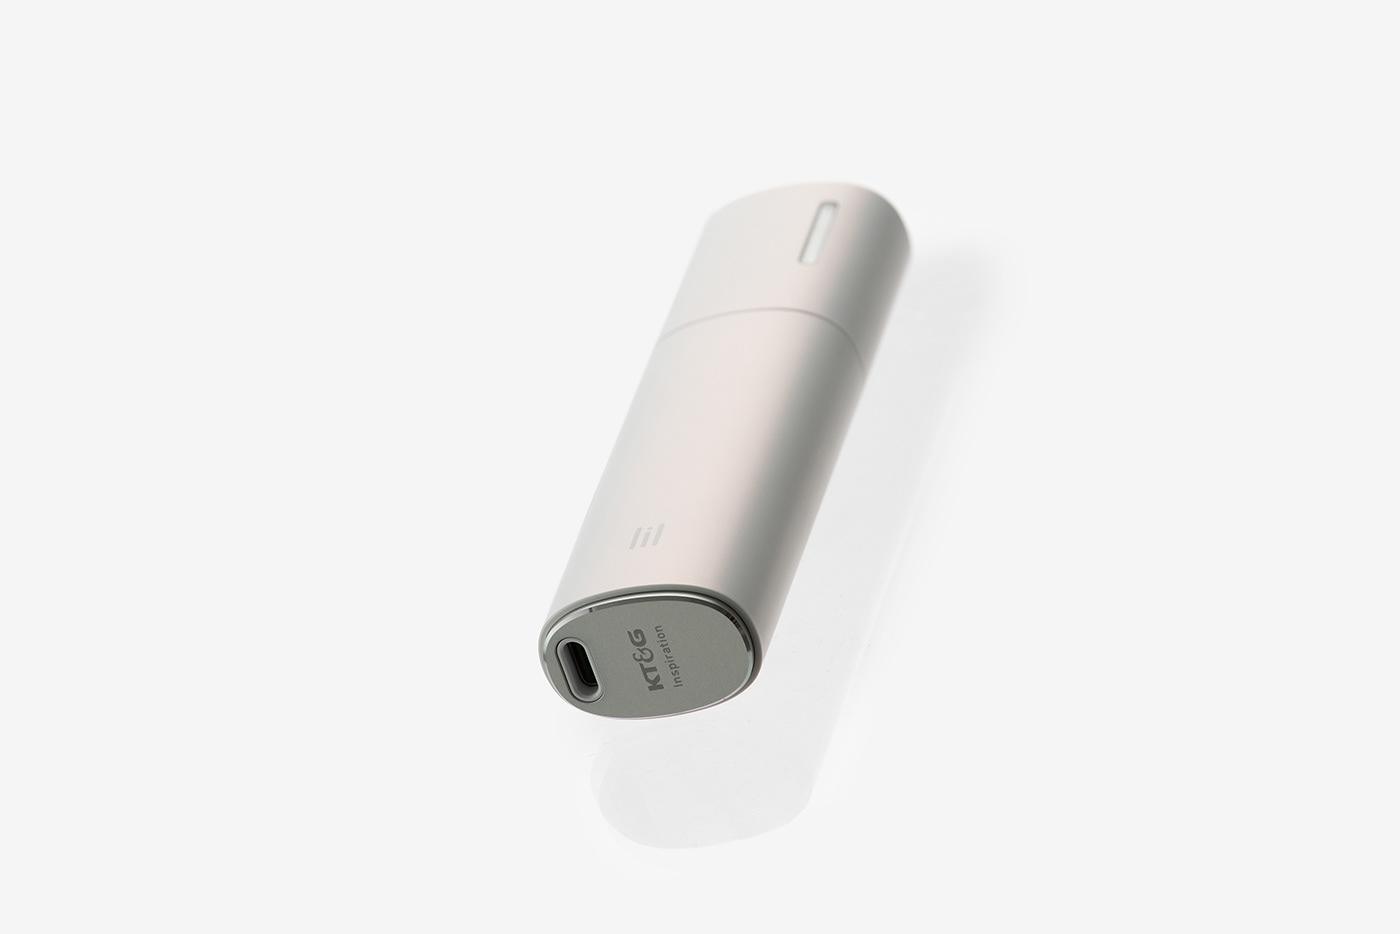 inspiration Design Award design studio E Cigarette electronic cigarette Industral Design product design  산업 디자인 제품디자인 yymmdd yymmdd studio